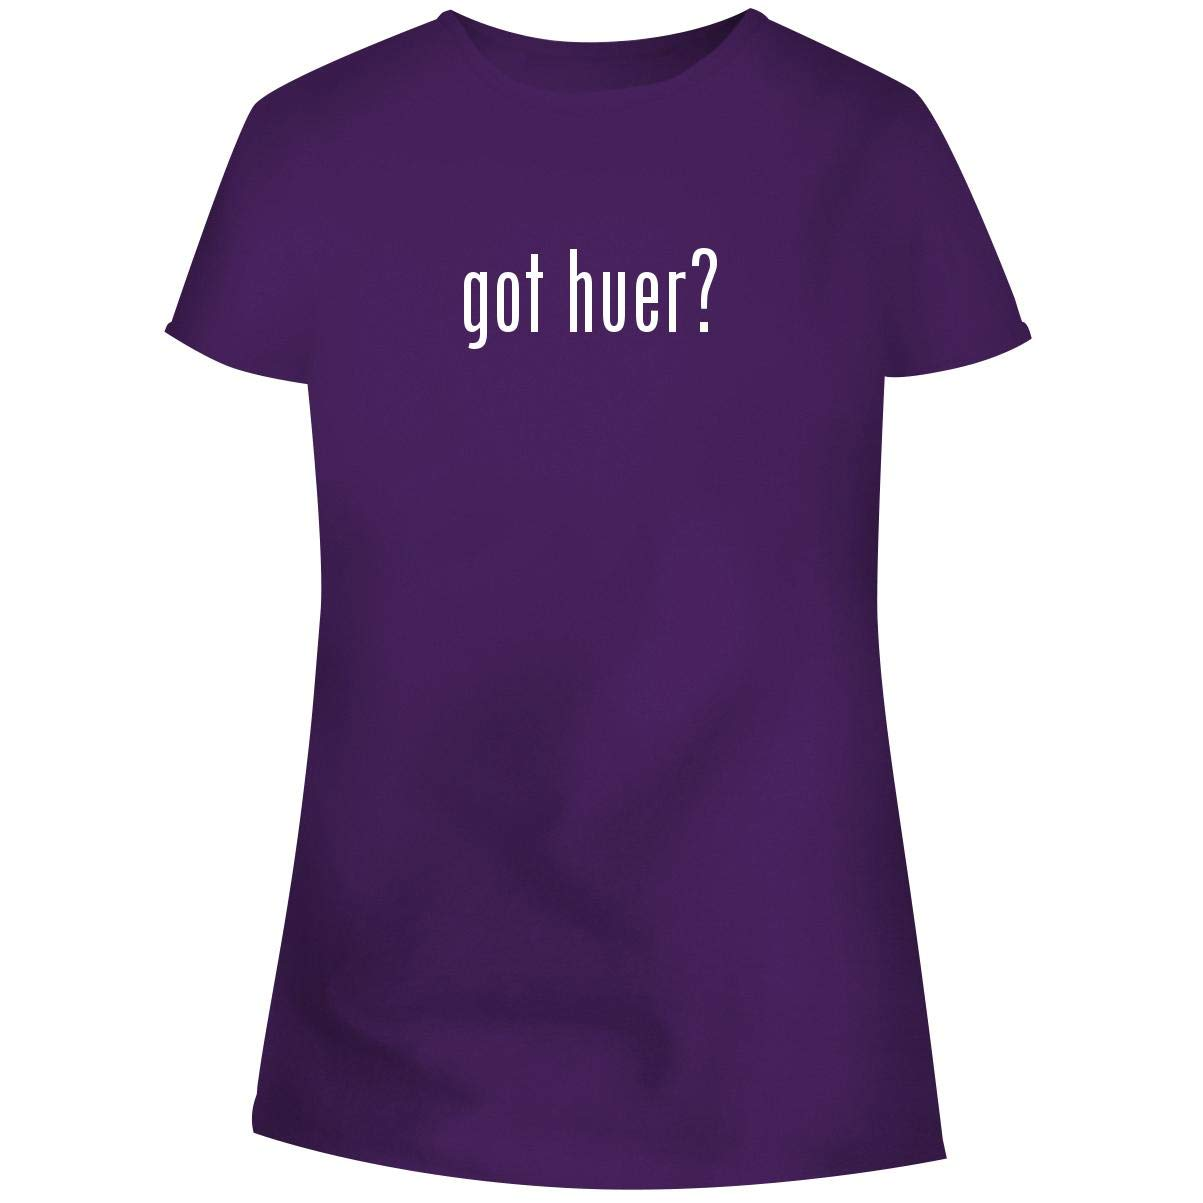 One Legging it Around got Huer? - Women's Soft Junior Cut Adult Tee T-Shirt, Purple, Medium by One Legging it Around